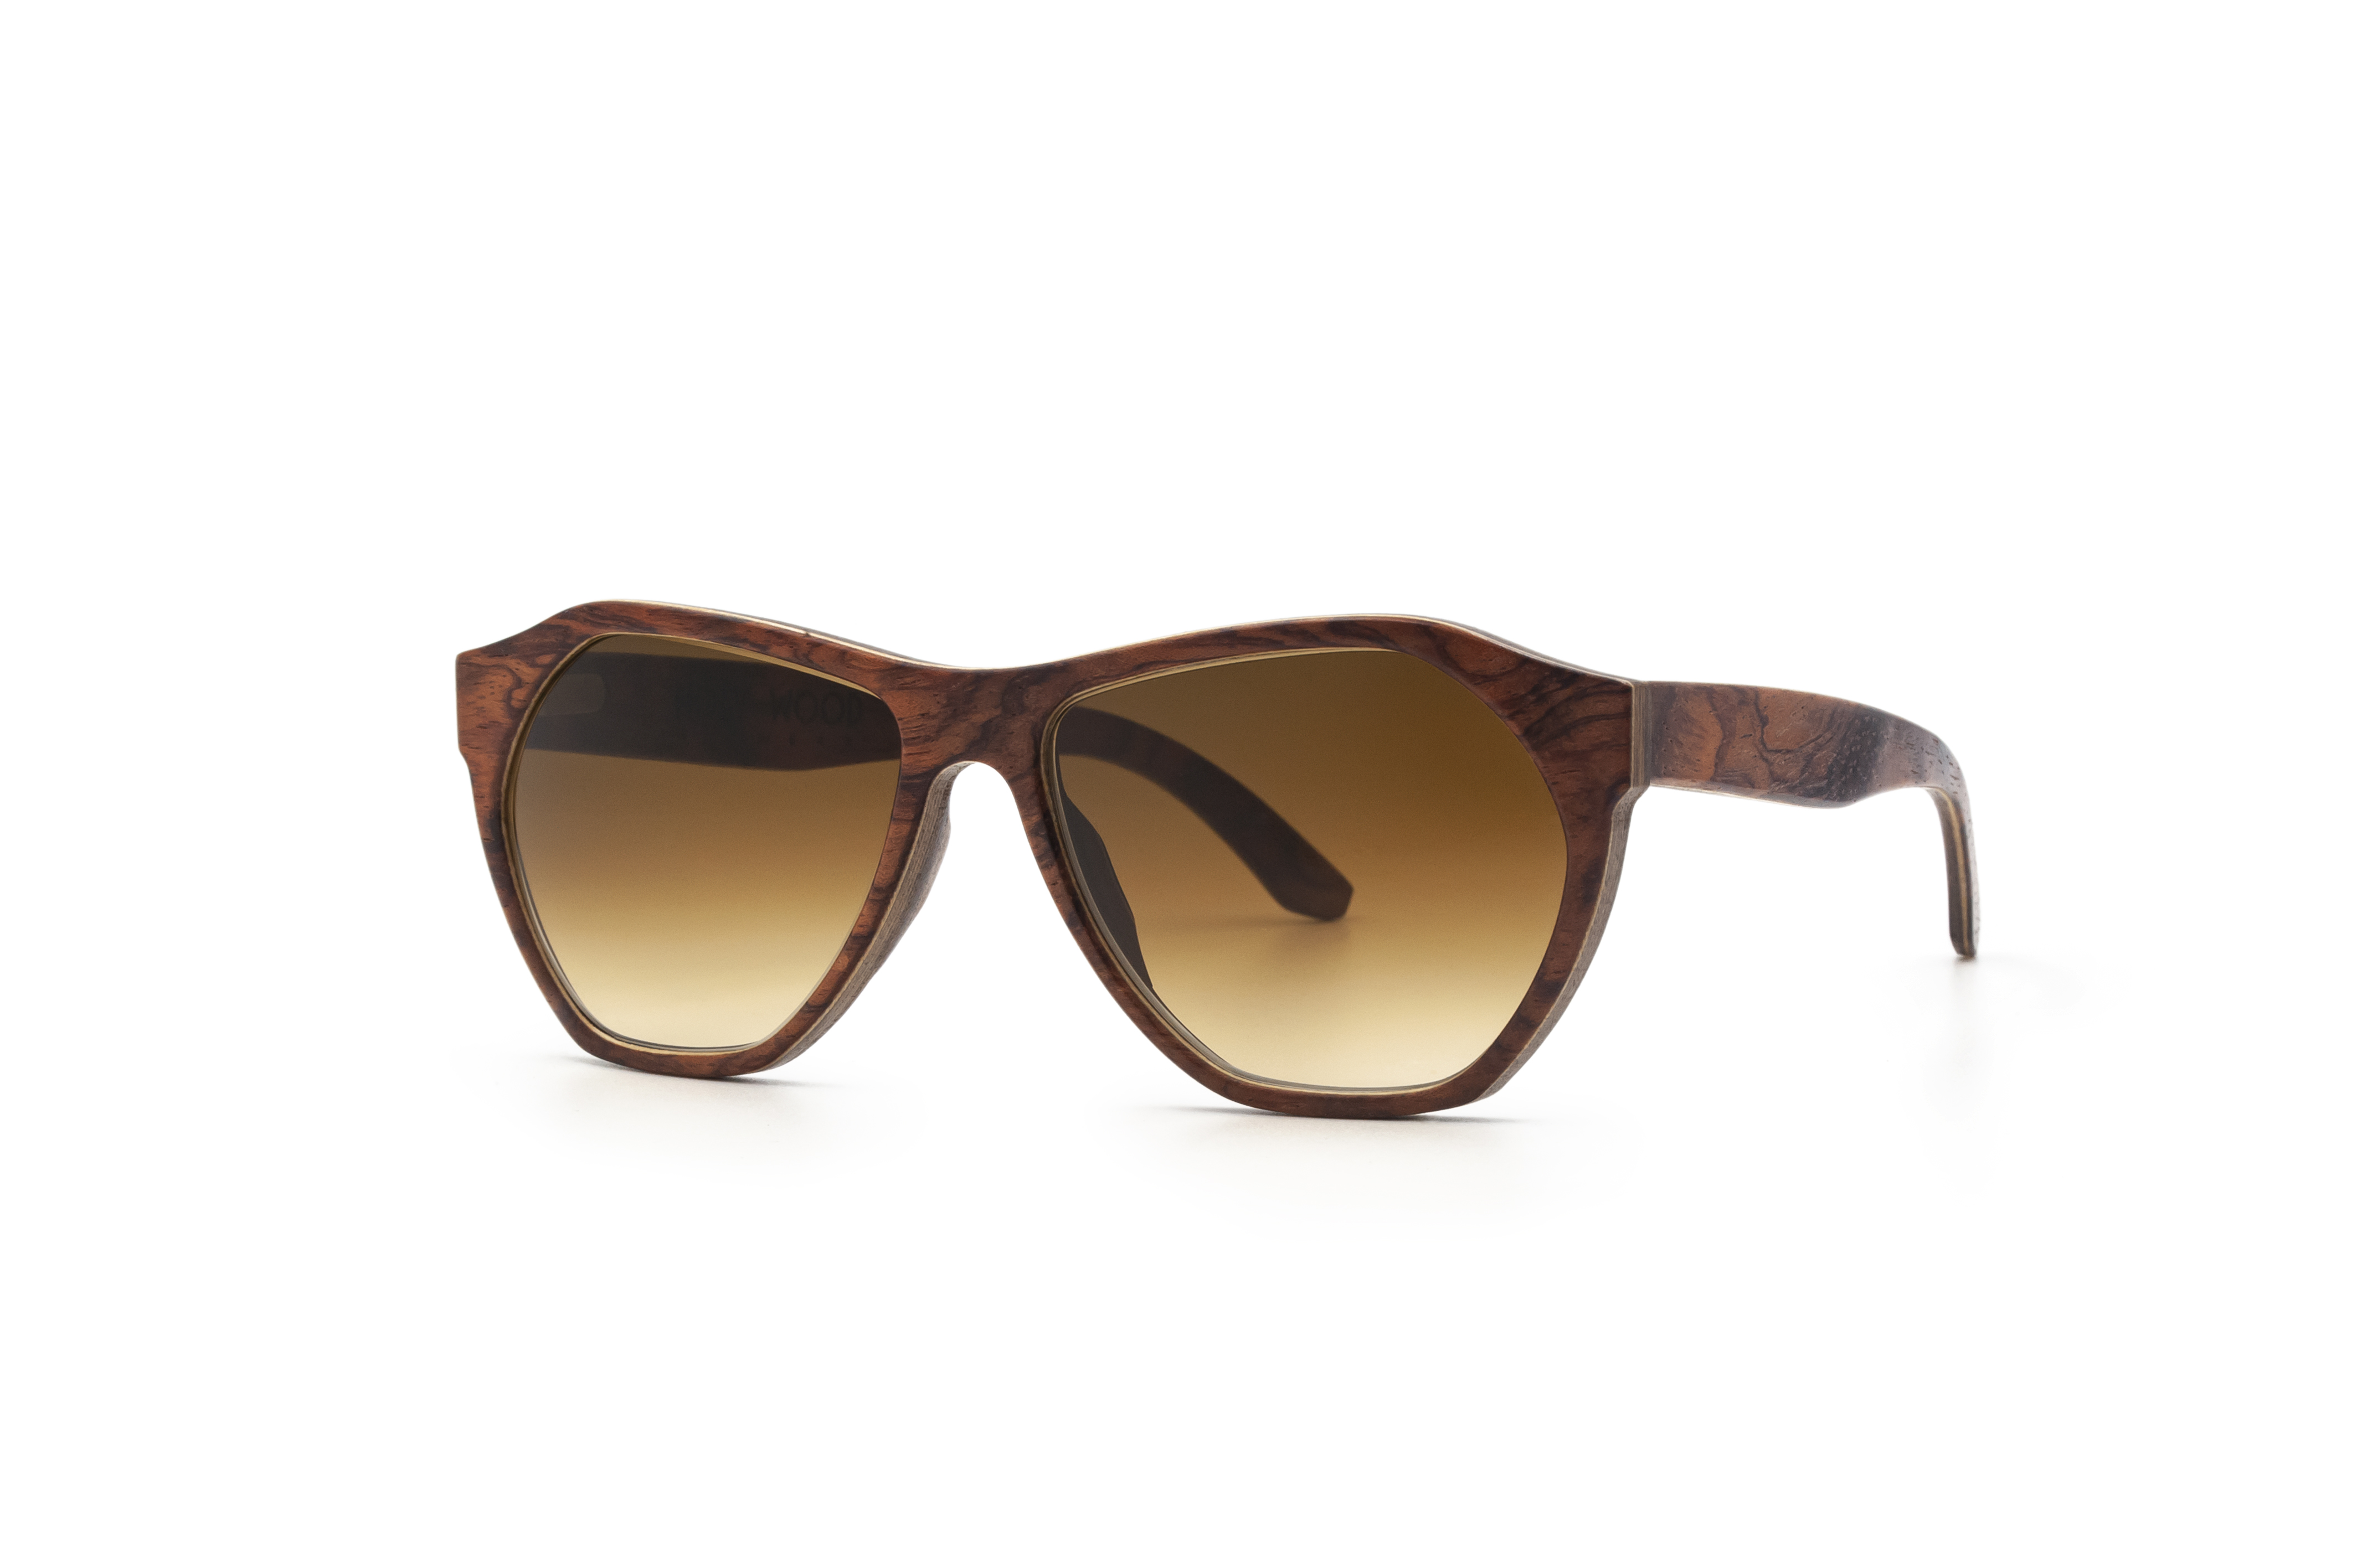 Gabriel Sun Bubinga Unisex Sunglasses Wooden Sunglasses